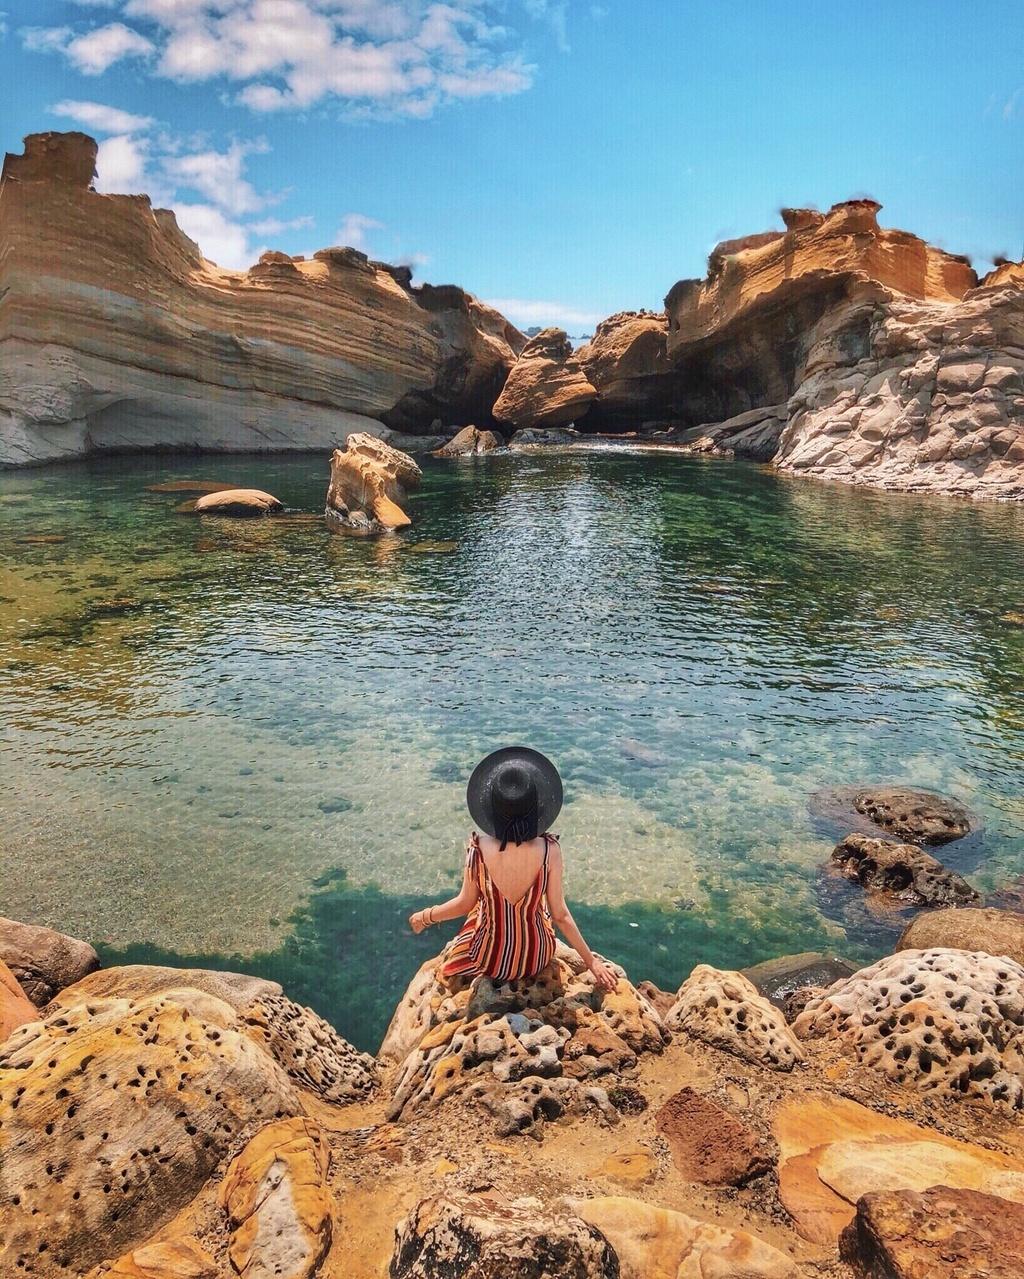 #Mytour: Lac theo Ha Truc kham pha thien nhien mong mo Tan Bac hinh anh 22